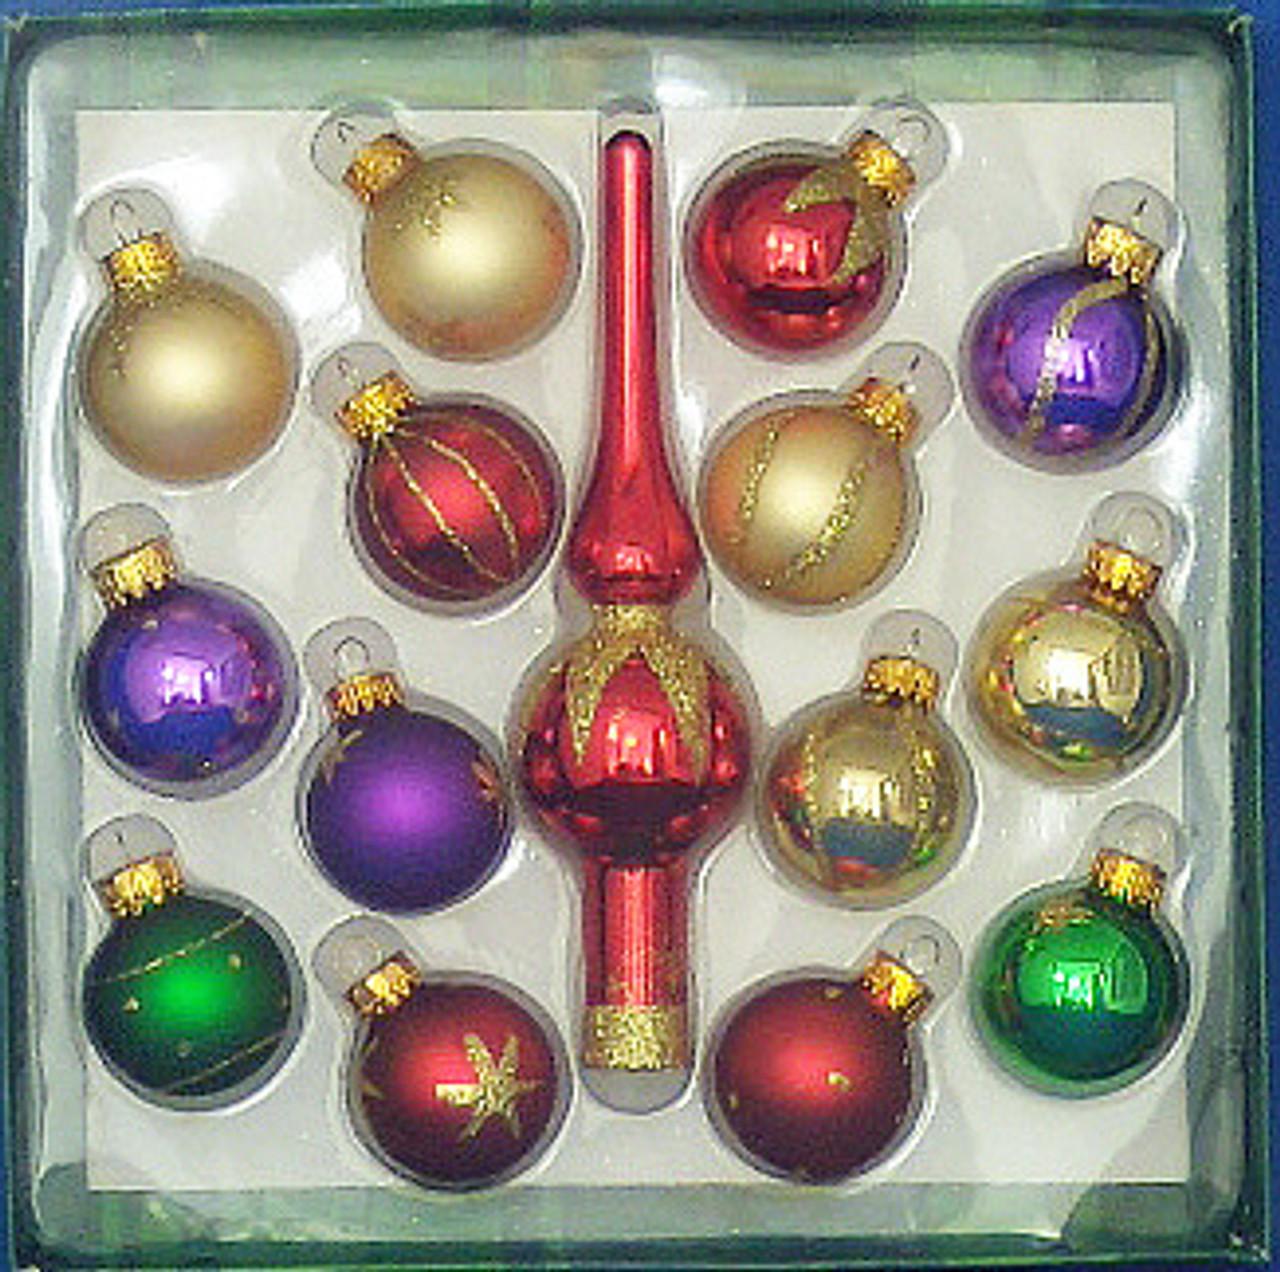 Home & Kitchen Ball Ornaments gasthof donau sigmaringen.de Set of ...